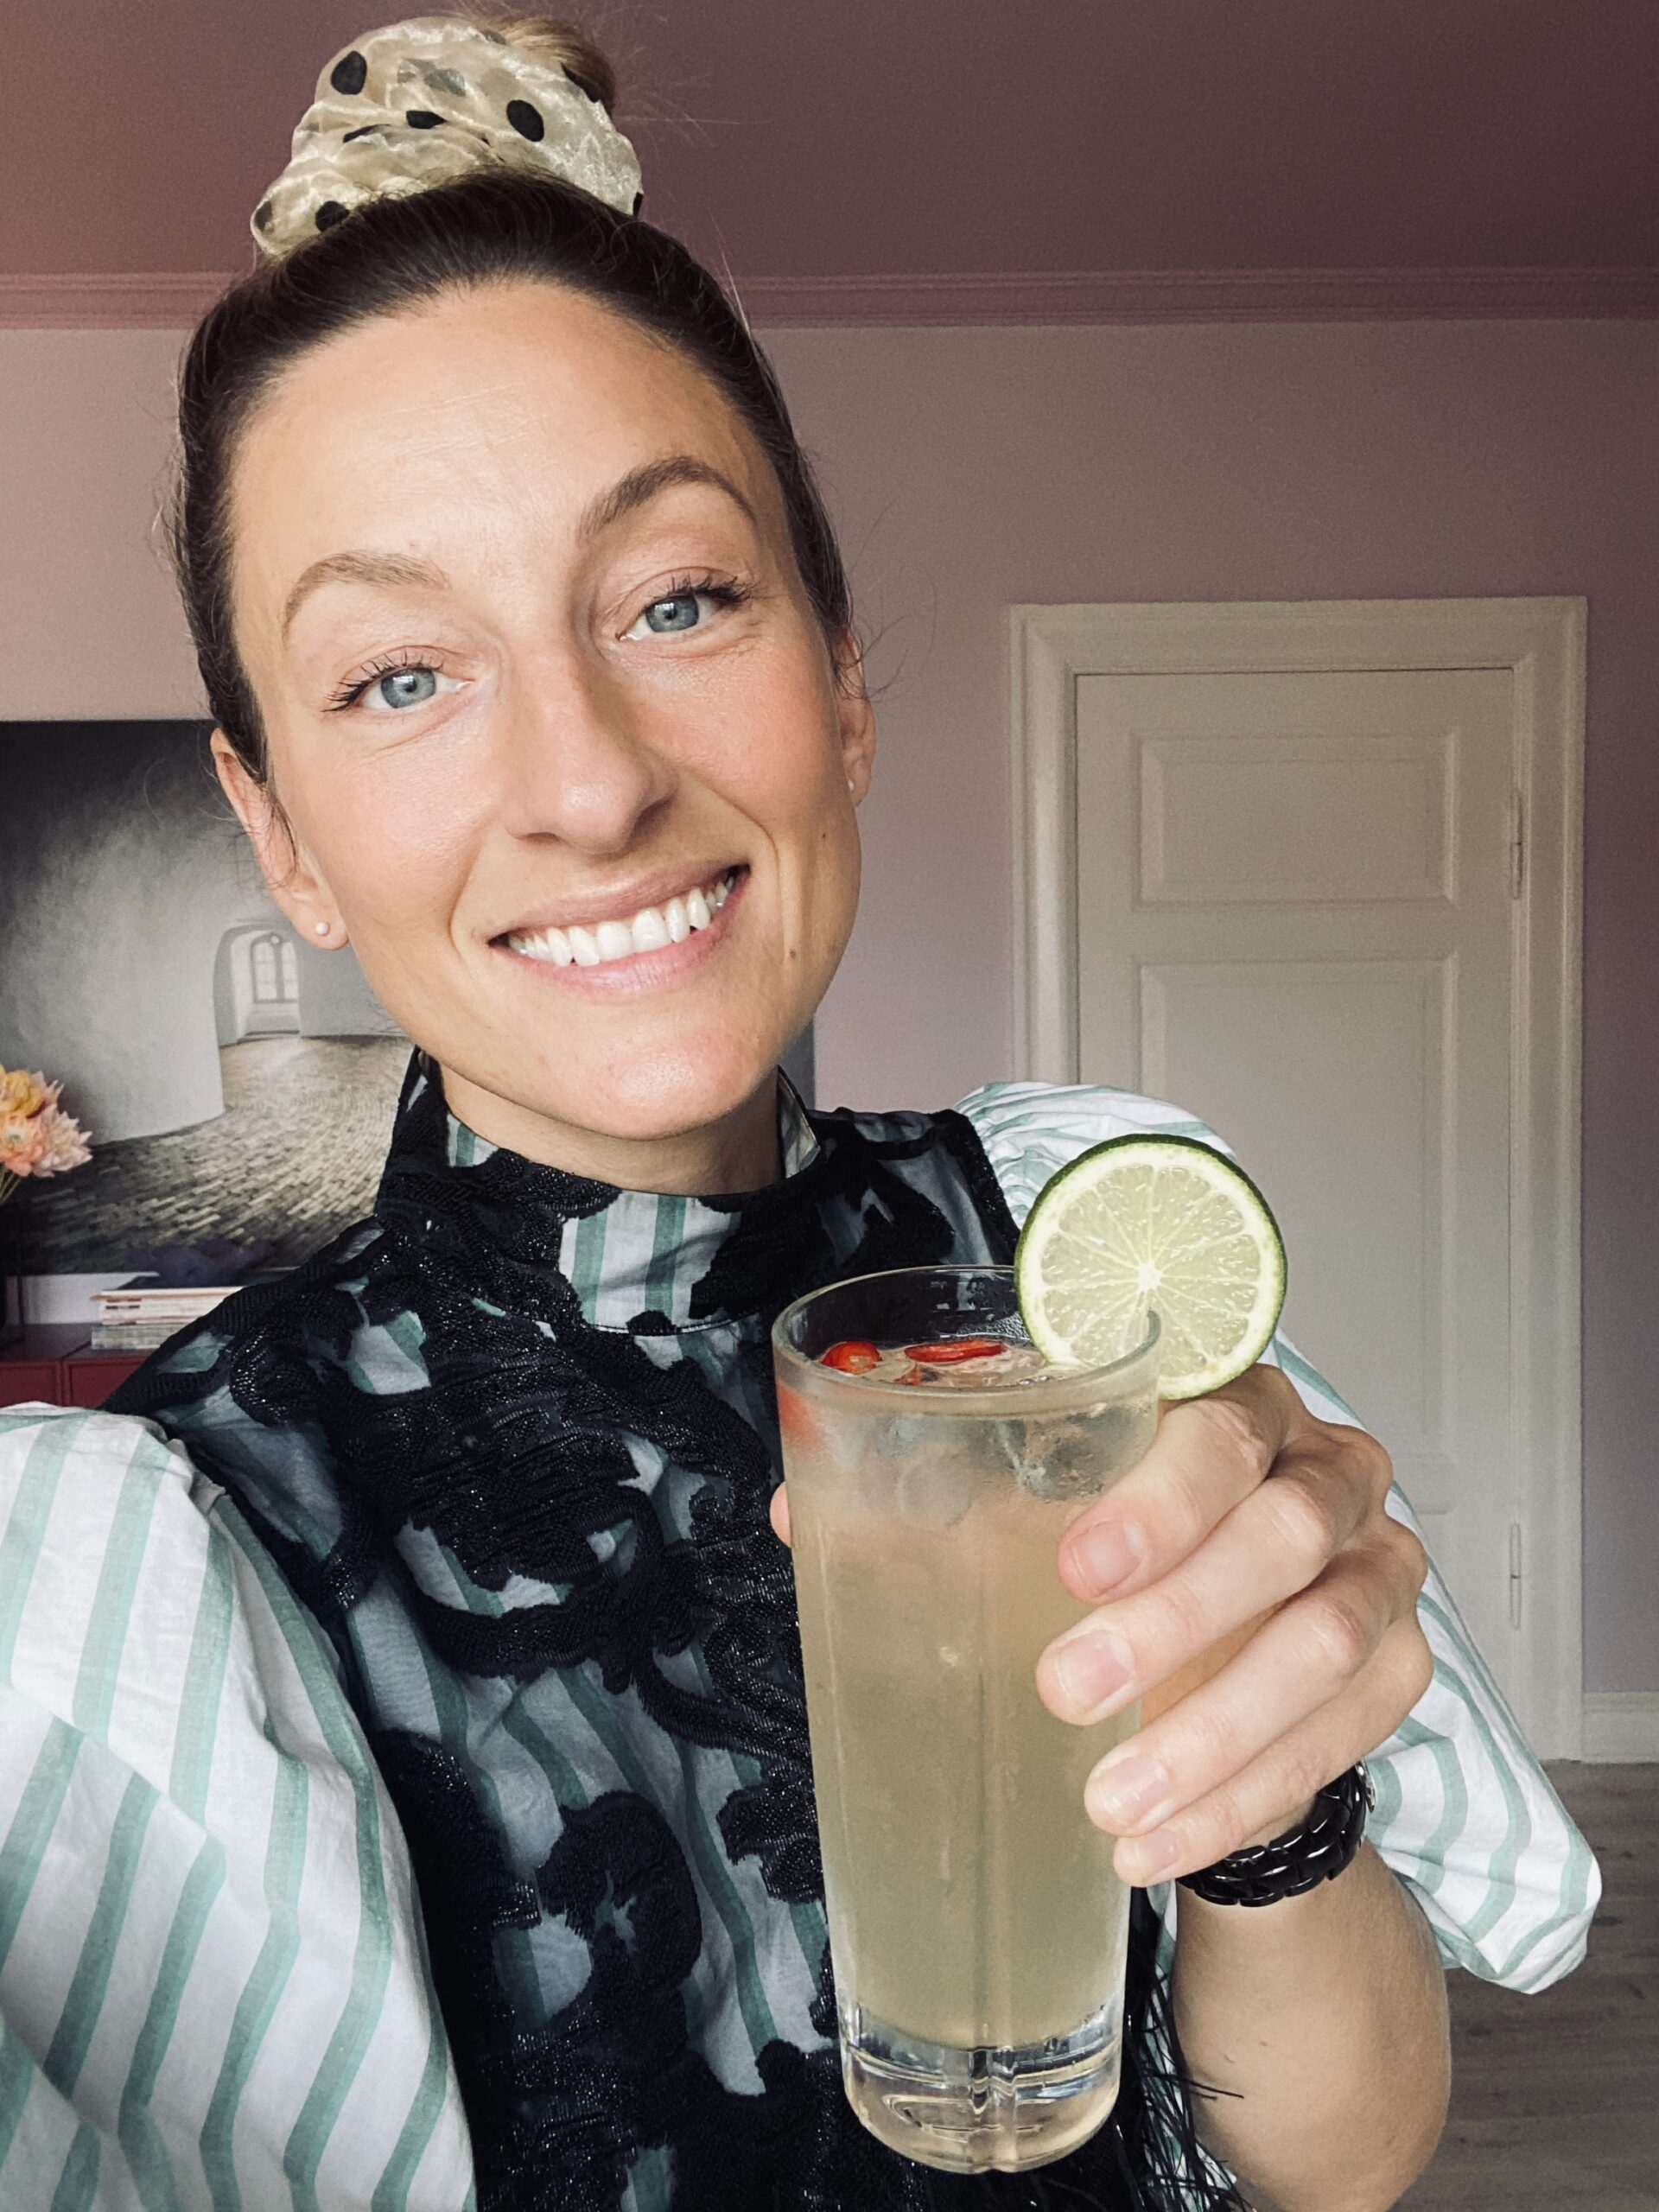 Annemette Rosendahl cocktail